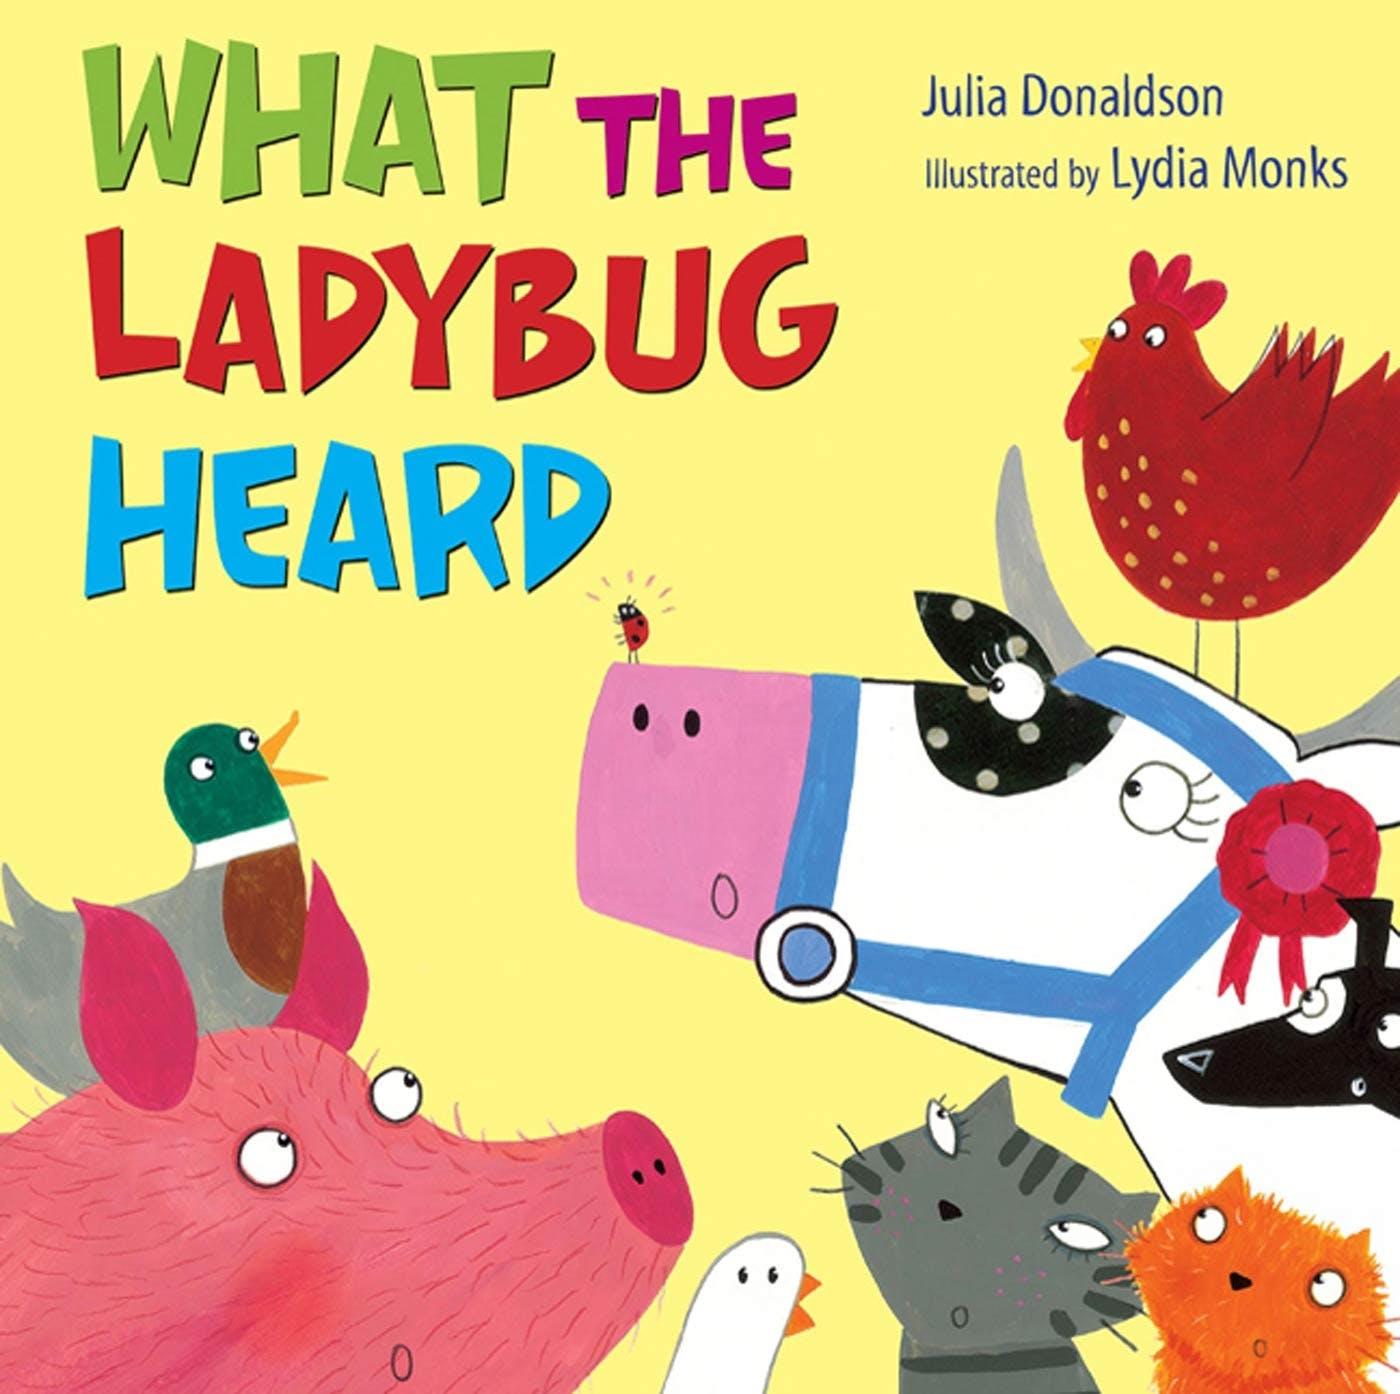 Image of What the Ladybug Heard